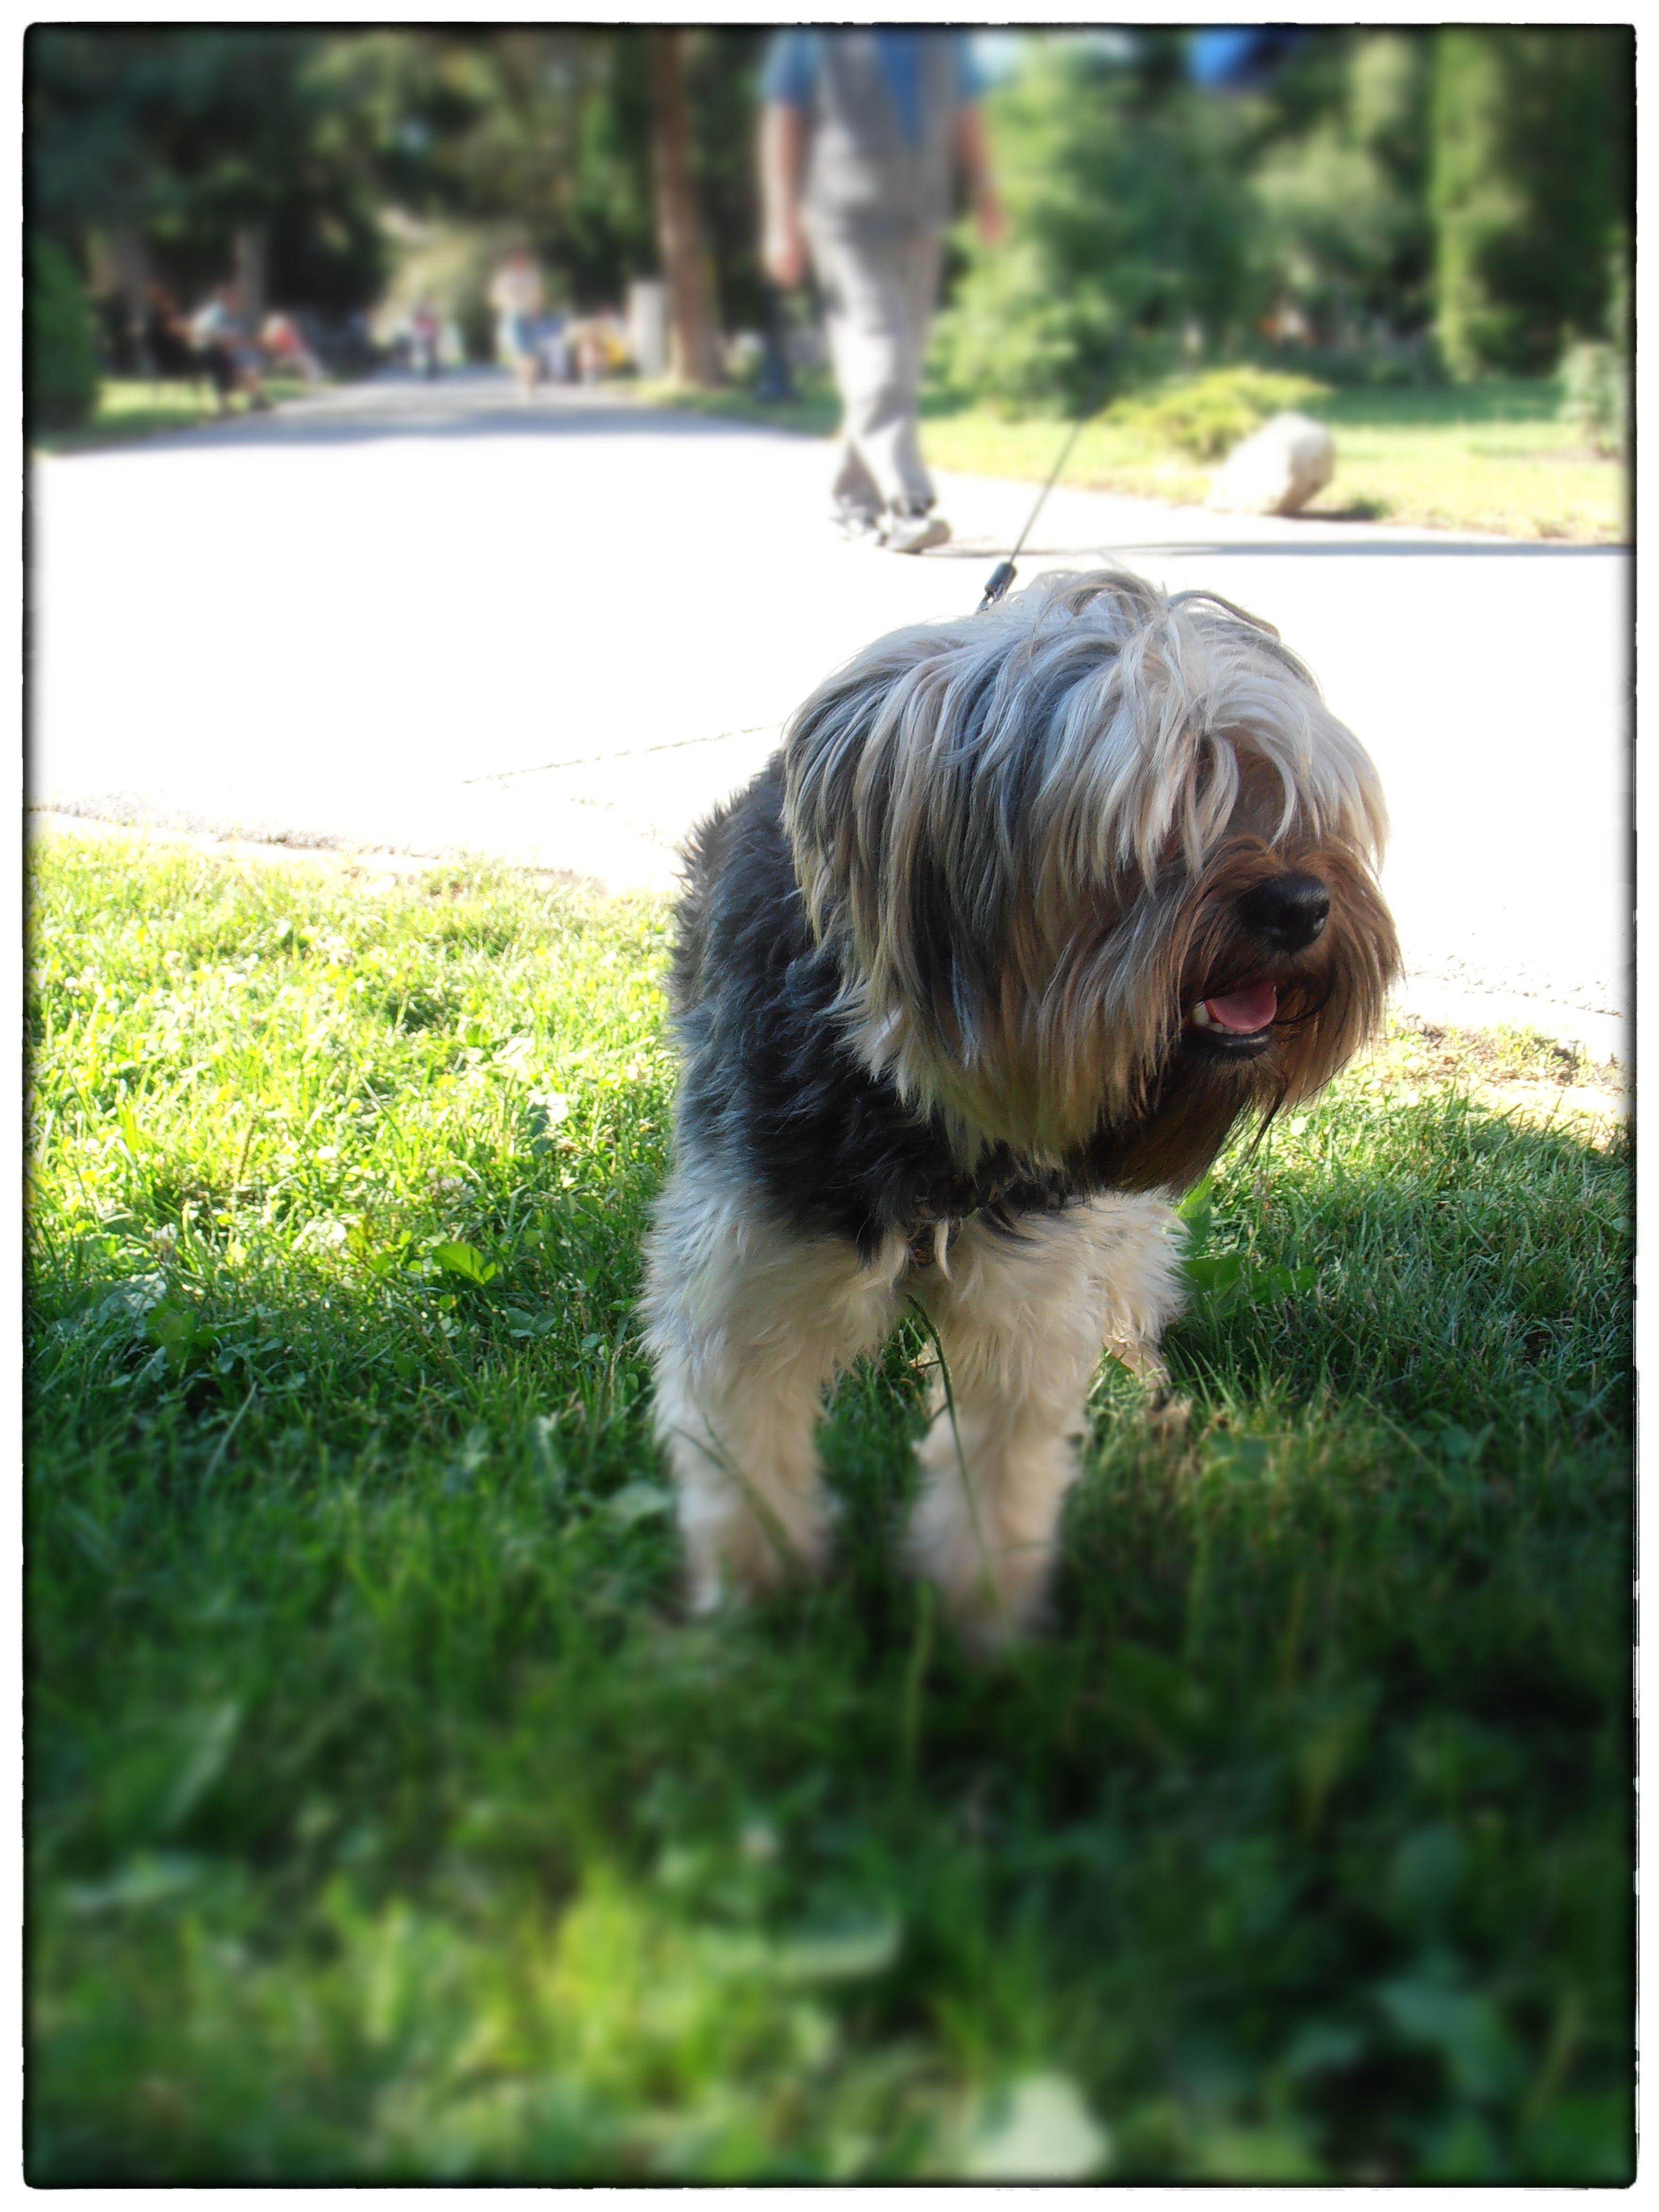 bfcfaa2c12ba Dang this dog looks just like benji